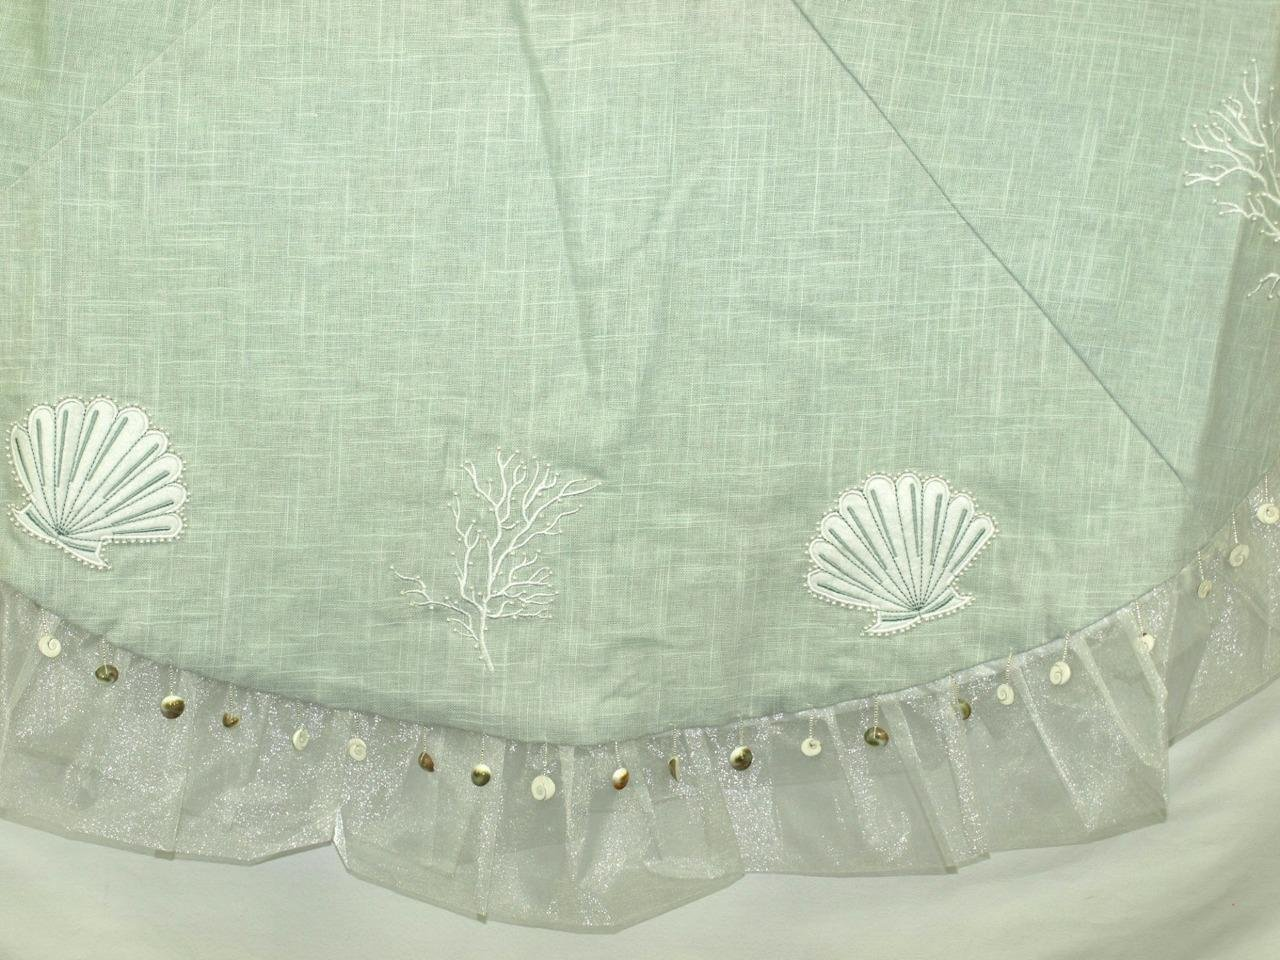 Season's Designs Seashell Themed Tree Skirt, Sea Green Linen Fabric, 56'' Wide